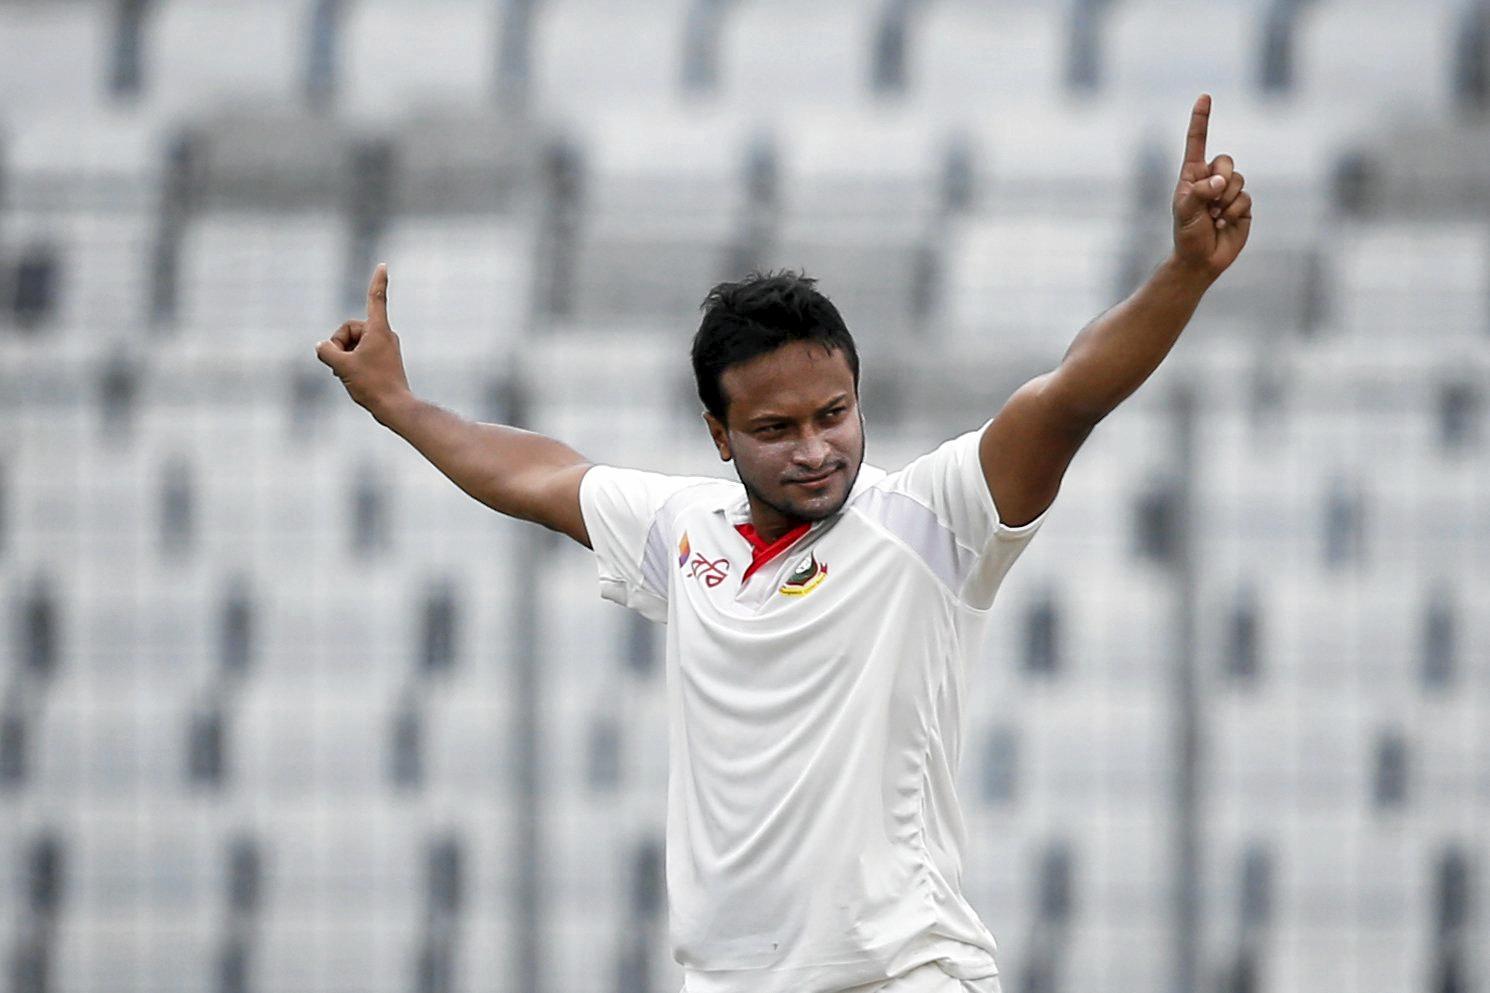 Bangladesh's Sakib Al Hasan celebrates the dismissal of Australia's Matt Renshaw during the second day of their first test cricket in Dhaka, Bangladesh, Monday, Aug. 28, 2017. (AP Photo/A.M. Ahad)